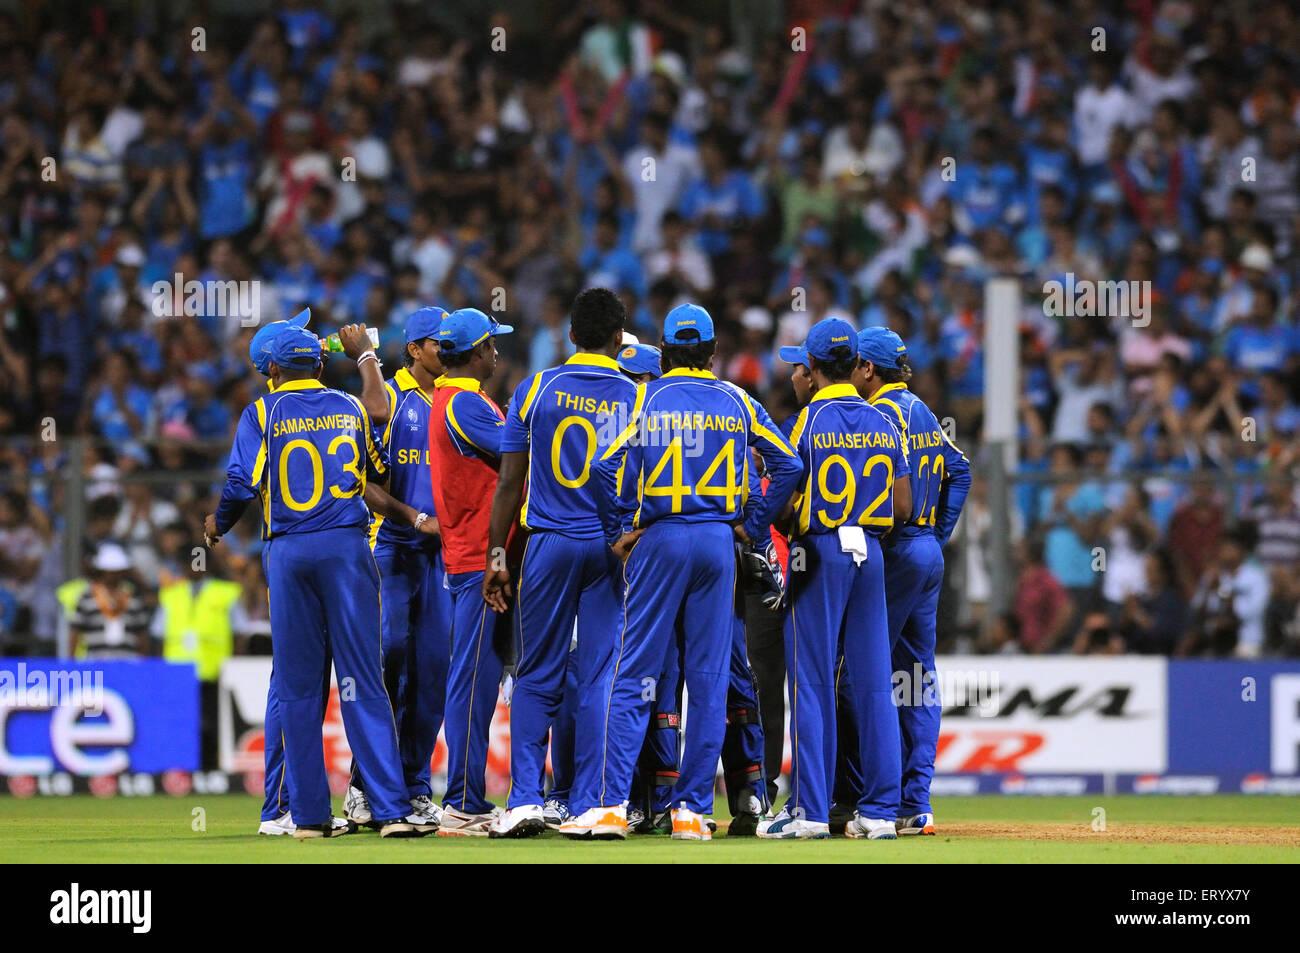 Sri Lankan team members 2011 ICC World Cup Final India Sri Lanka Wankhede Stadium Mumbai - Stock Image